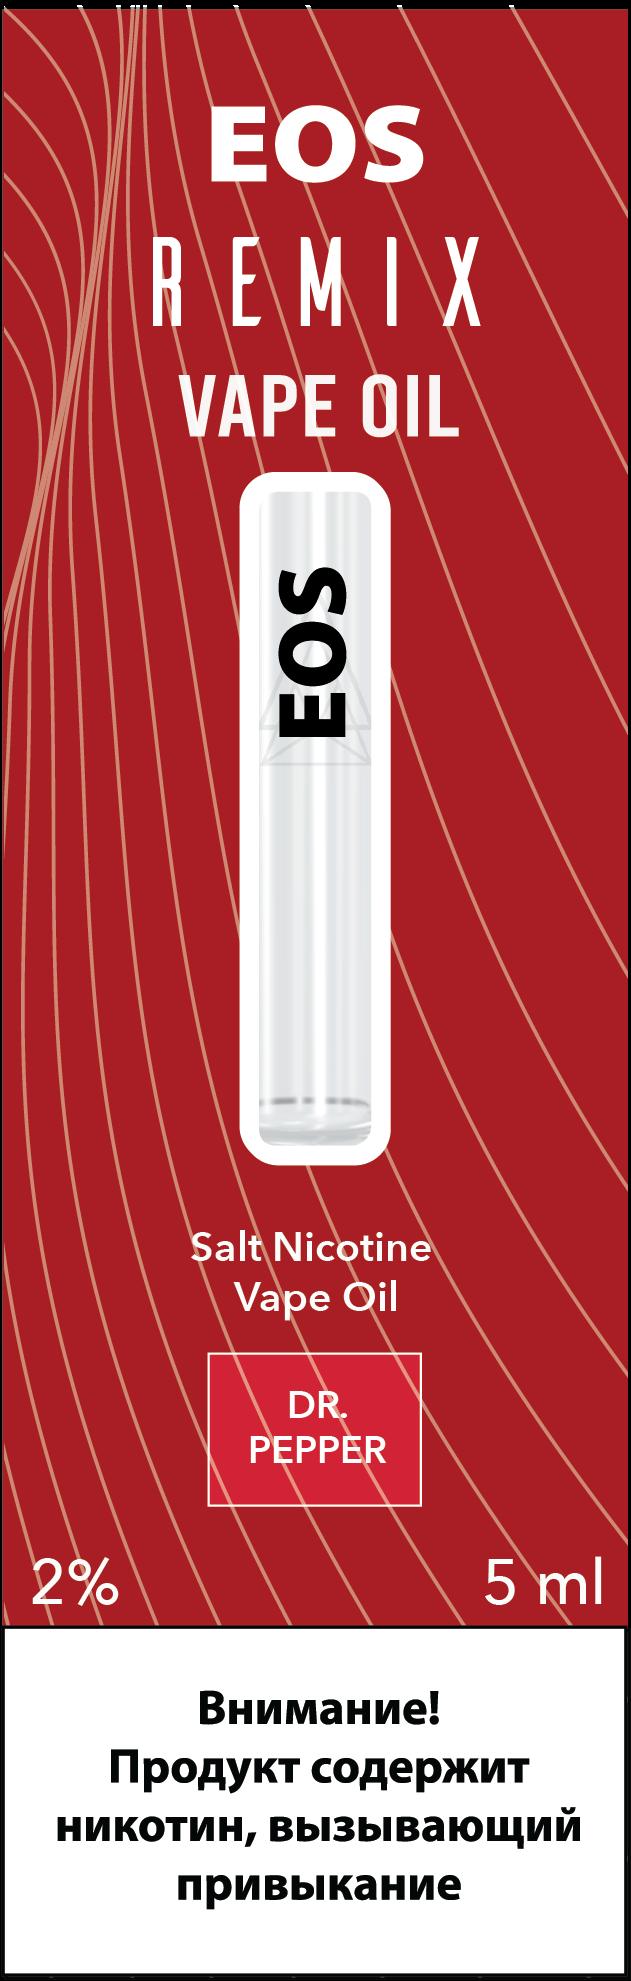 EOS REMIX SALT NIC DR. PEPPER 2% 5ml